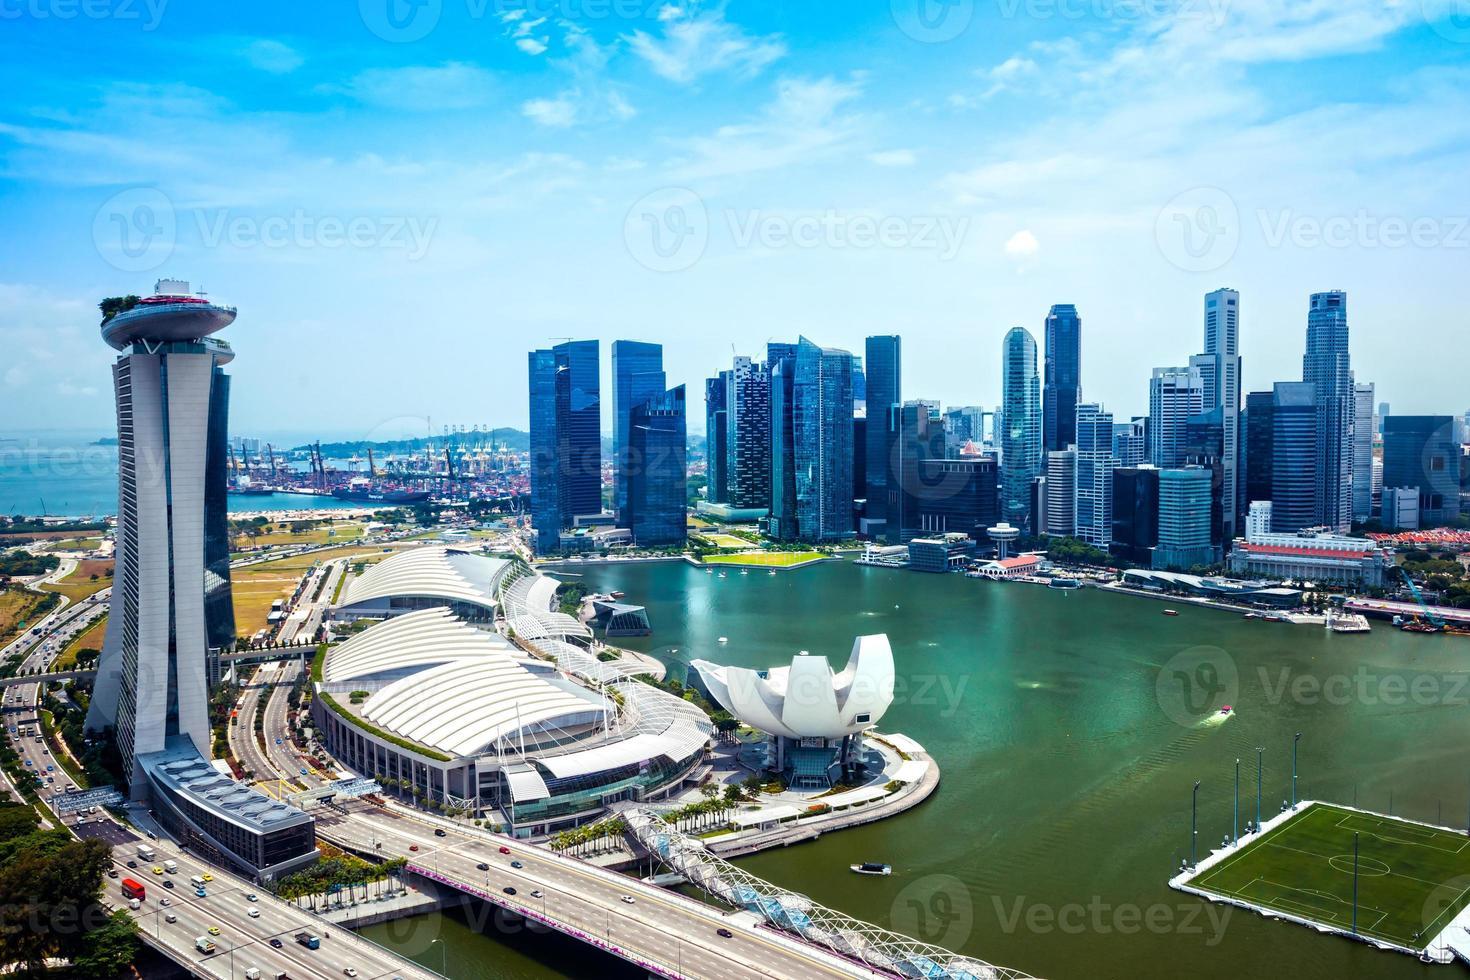 vidvinkelvy av singapore stadshorisont. foto